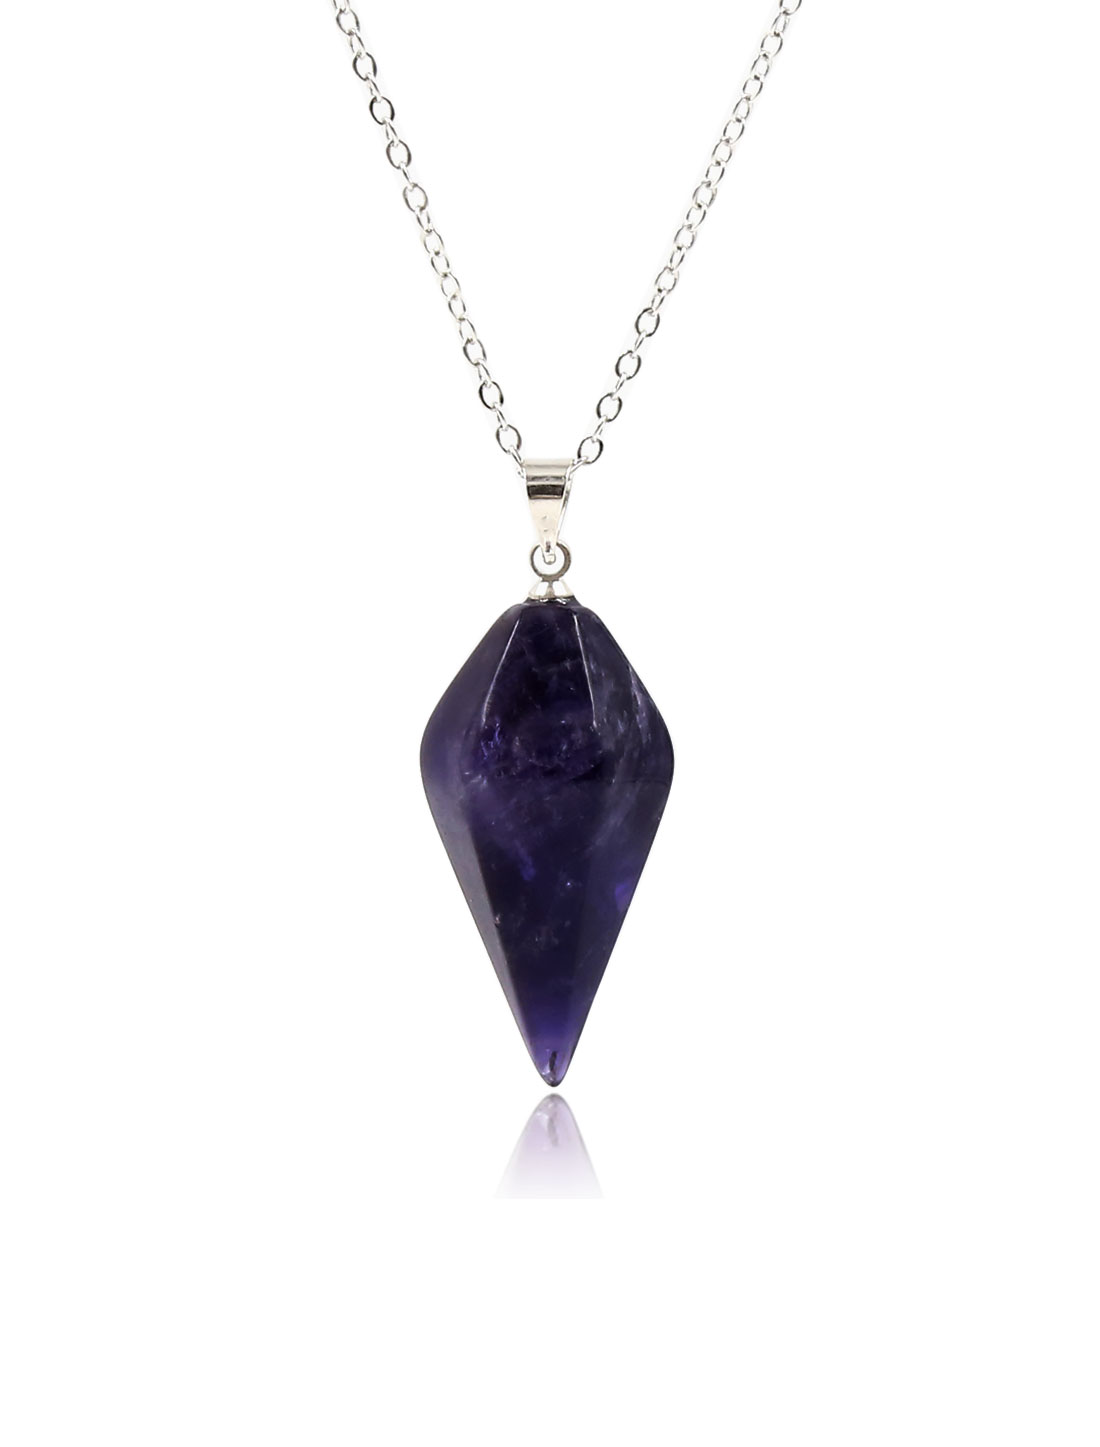 Amethyst Gemstone Crystal Pendulum Dowsing Reiki Chakra Pendant Chain Necklace